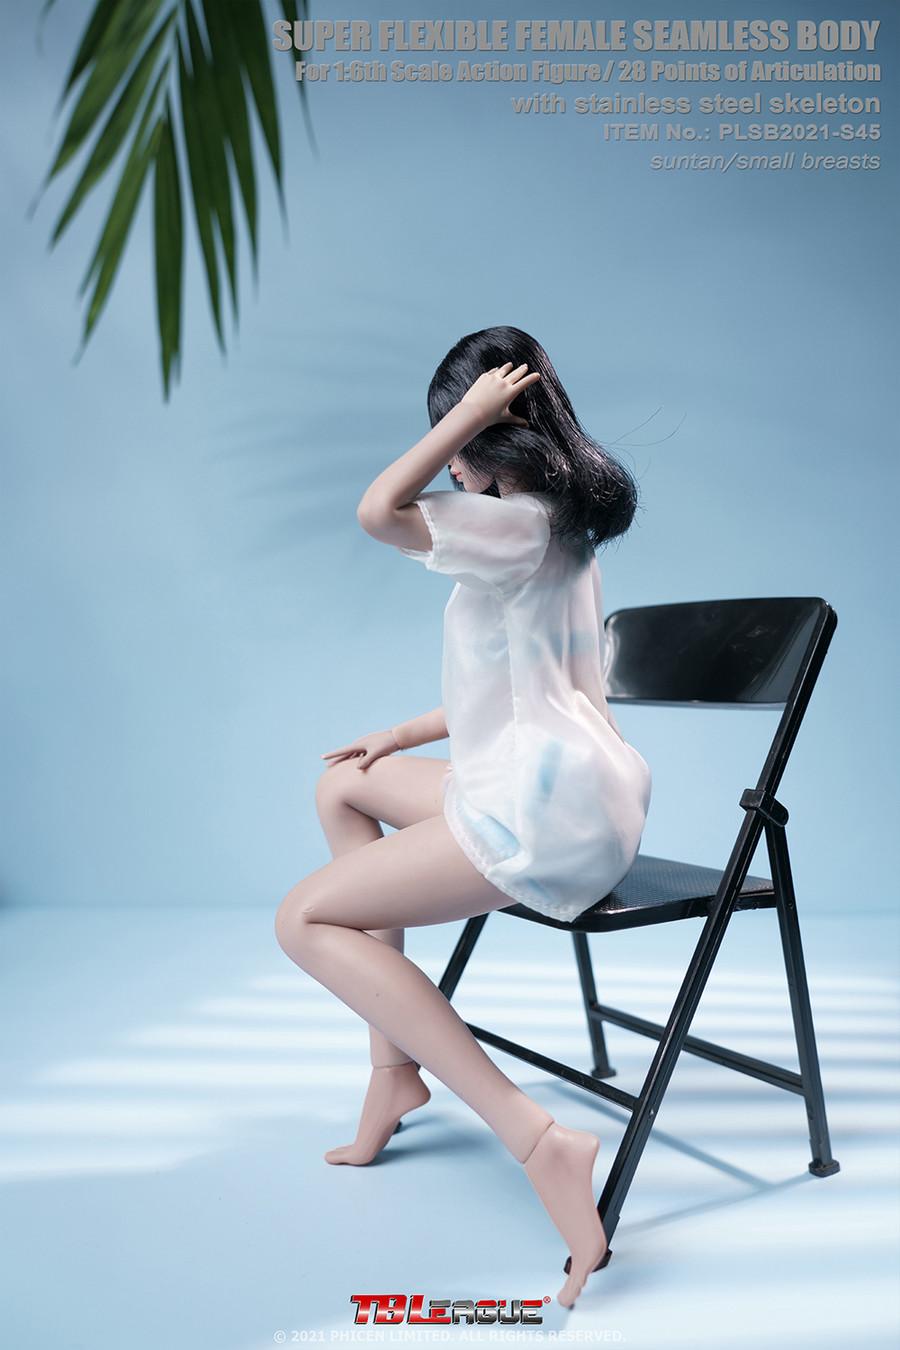 TBLeague - Suntan Female Super Flexible Seamless Body Small Breast with Headsculpt - S45